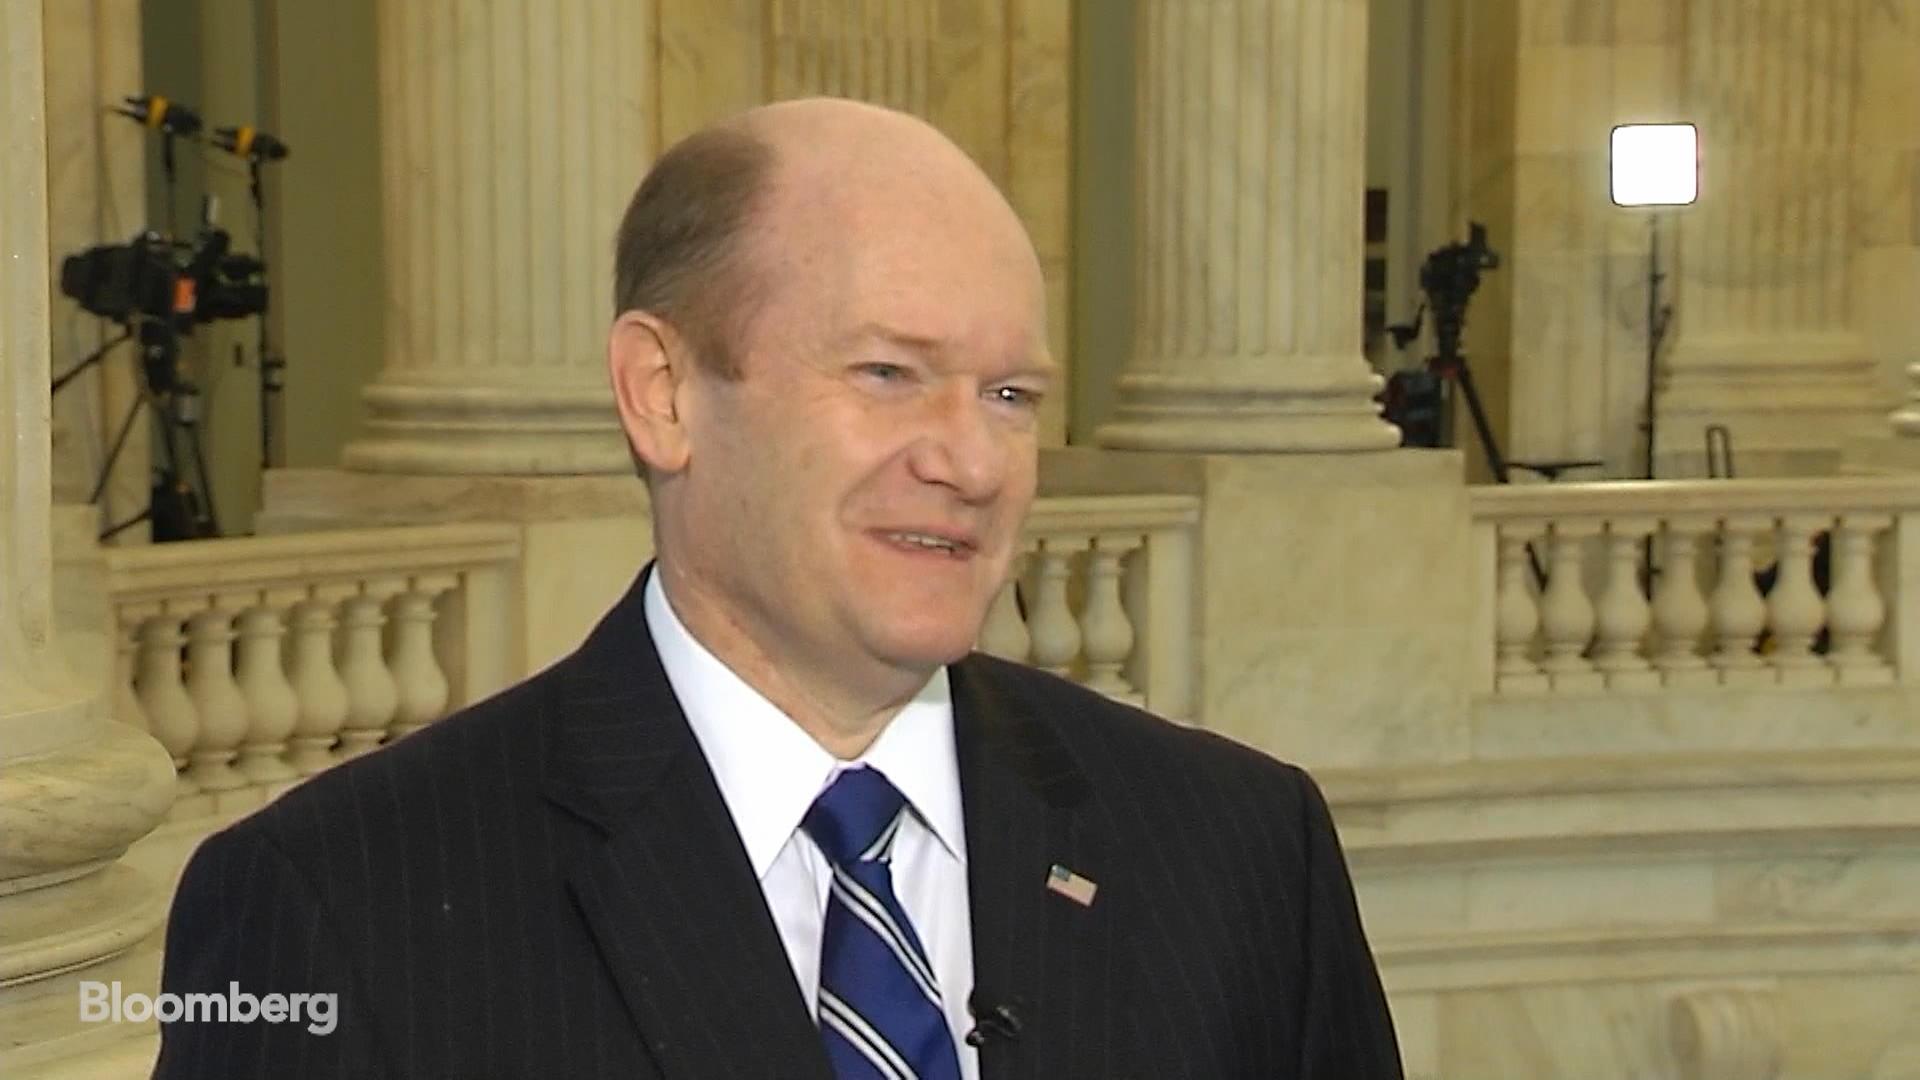 Sen. Coons on Energy Bill, USMCA, Biden, Impeachment